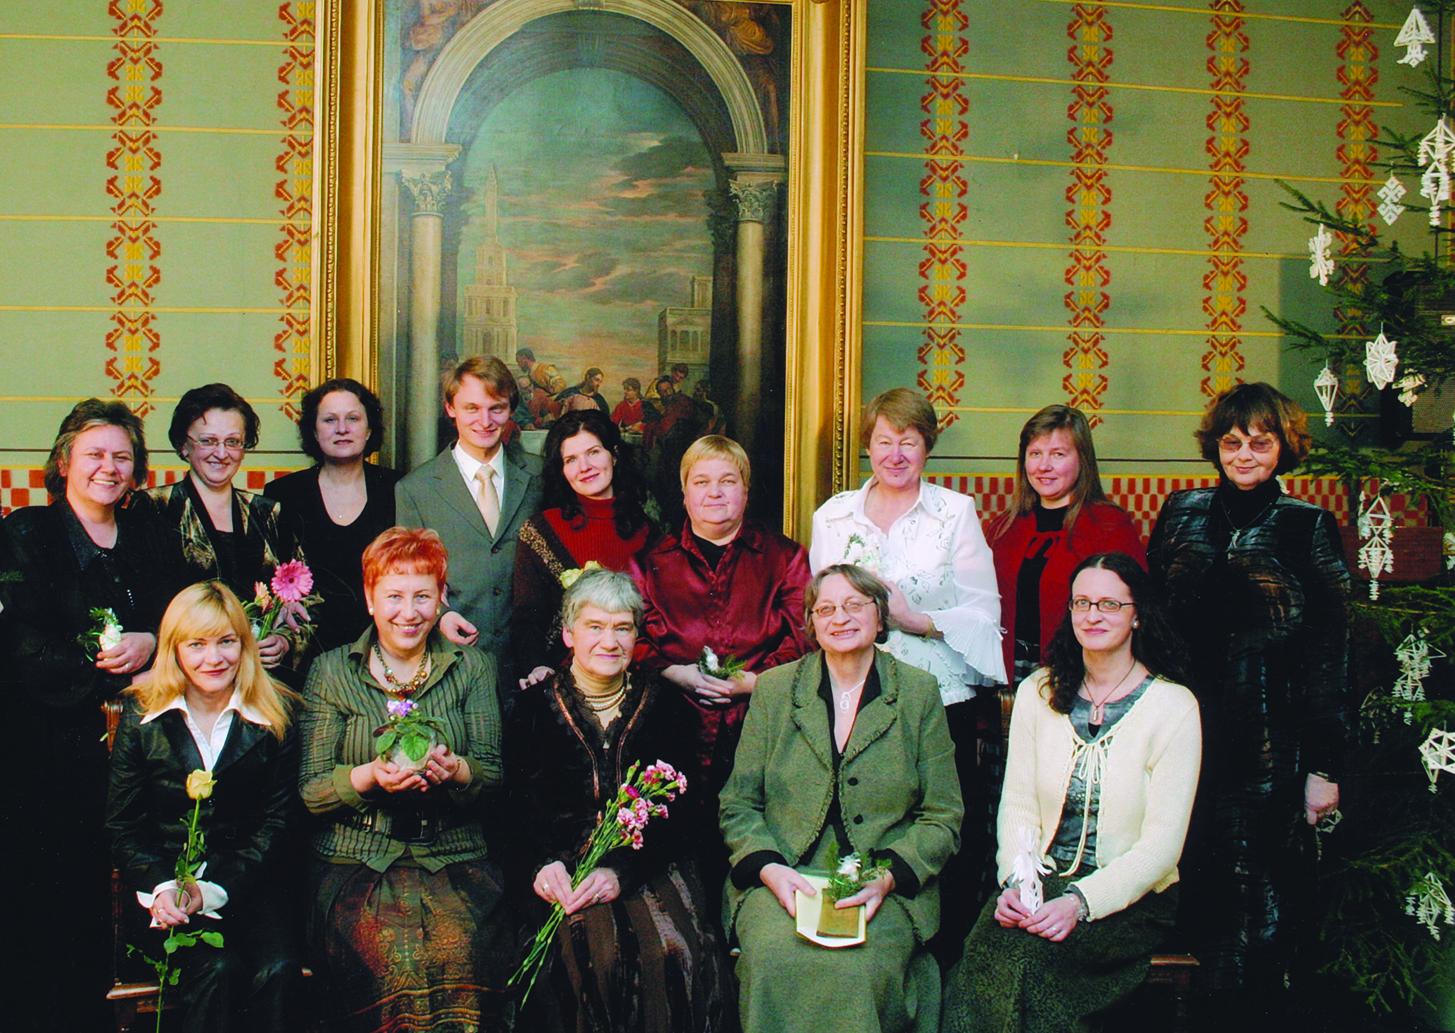 Moterų menininkių vakaras 2007 m. Sėdi iš kairės: poetės T. Marcinkevičiūtė, A. Ruseckaitė, A. Puišytė, prozininkė R. Vinciūnienė, tautodailininkė E. Vindašienė; stovi pianistė A. Eitmanavičiūtė, solistė S. Martinaitytė, aktorė V. Grigaitytė, solistas L. Mikalauskas, poetės E. Drungytė, D. Zelčiūtė, Z. Gaižauskaitė, R. Mikuckytė ir I. Labokė.